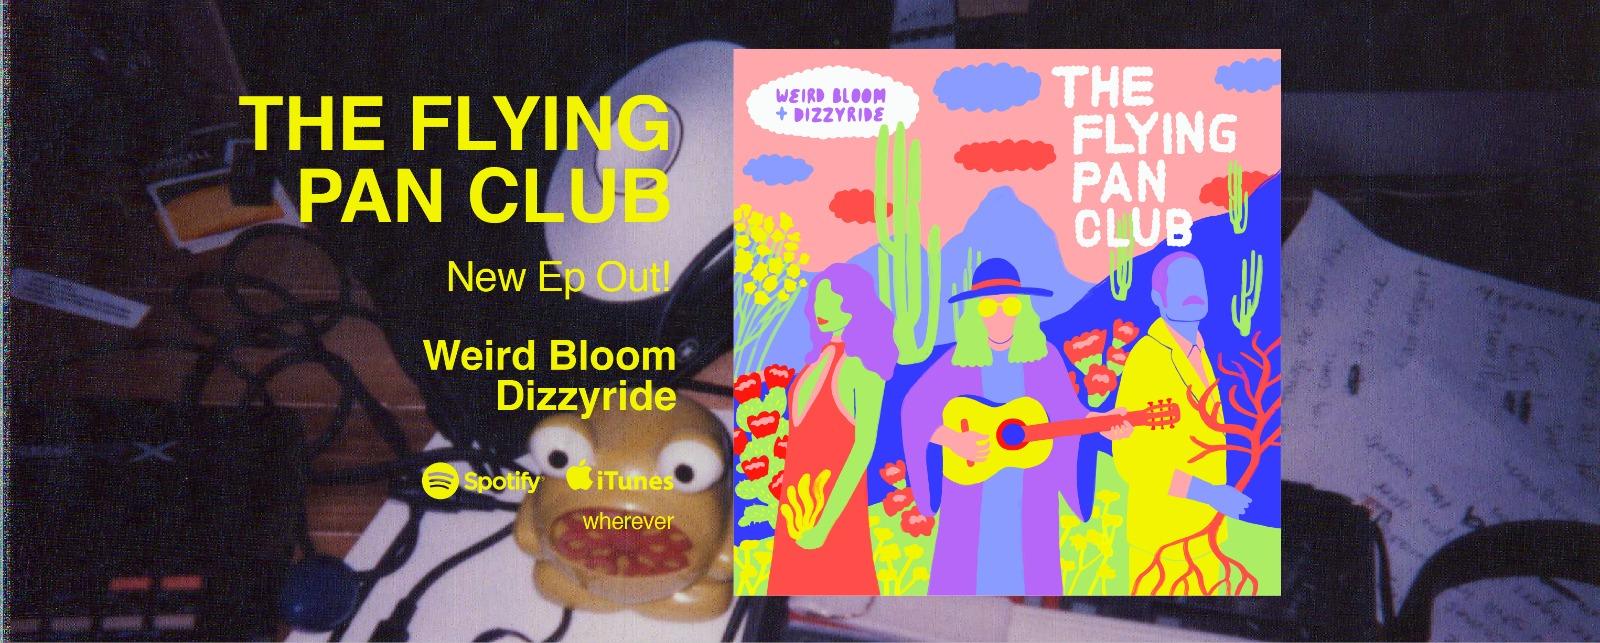 oddwop fb banner pan club.jpg